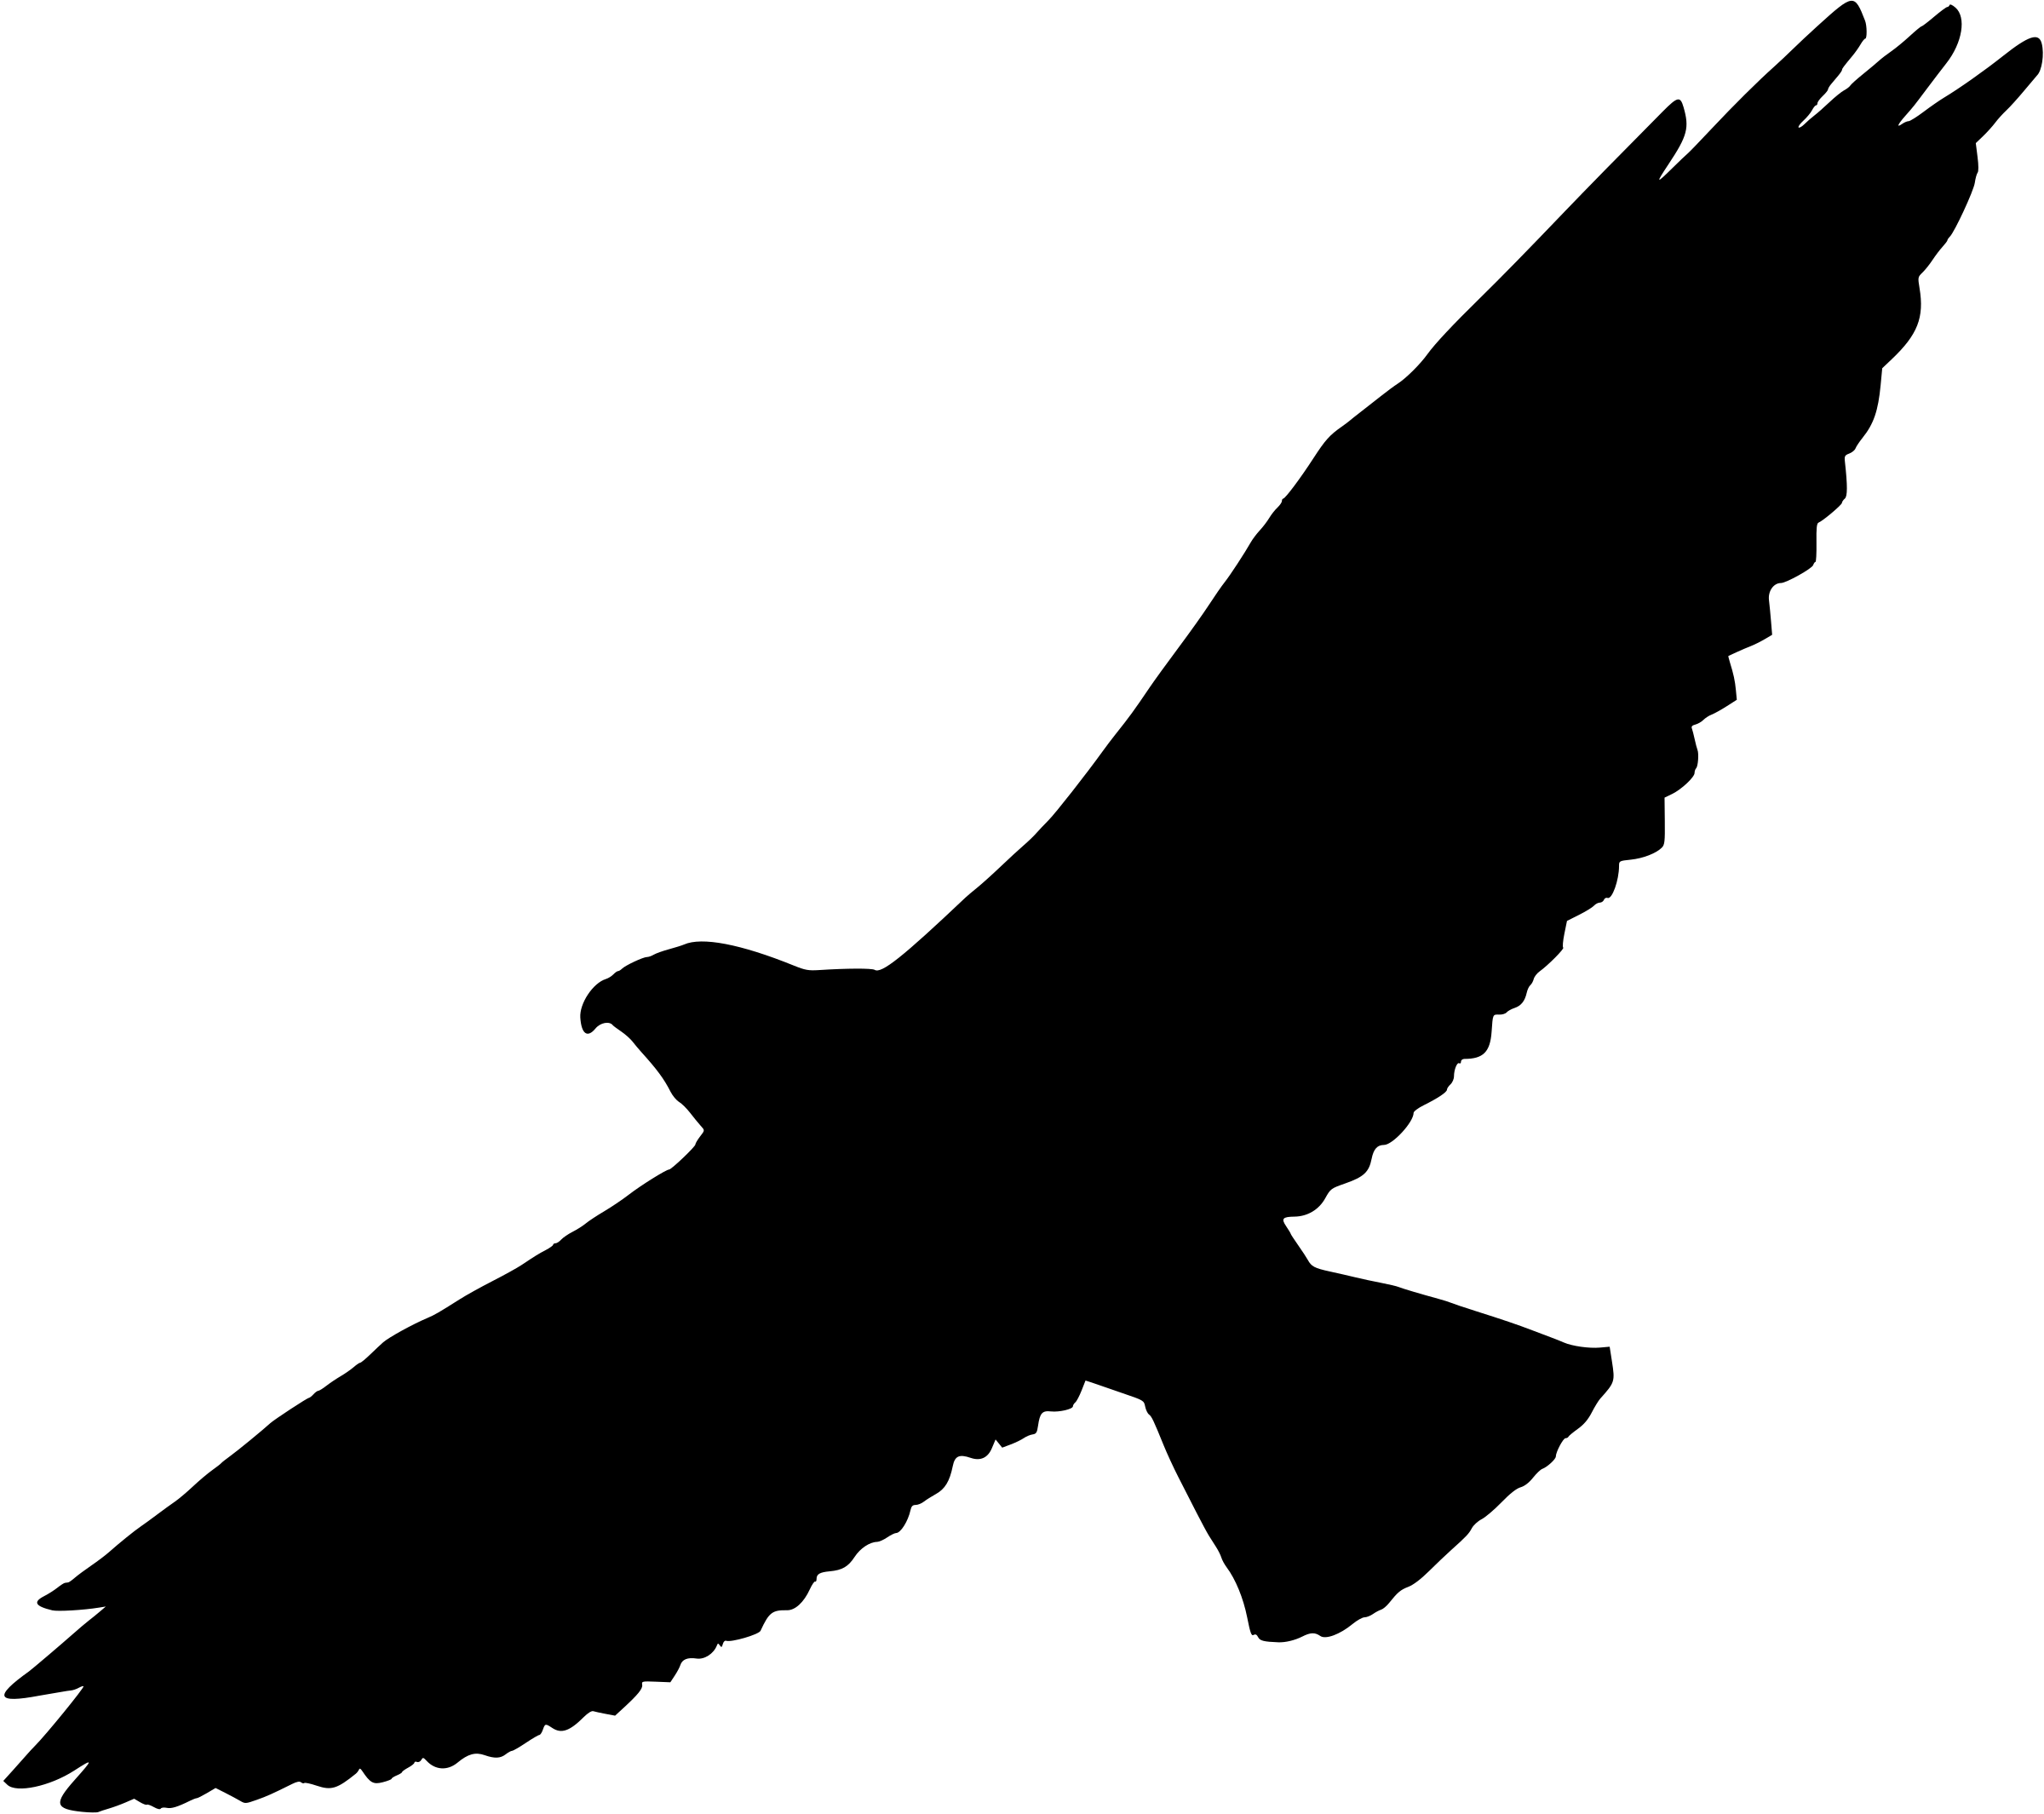 Peregrine falcon silhouette at. Hawk clipart skyview